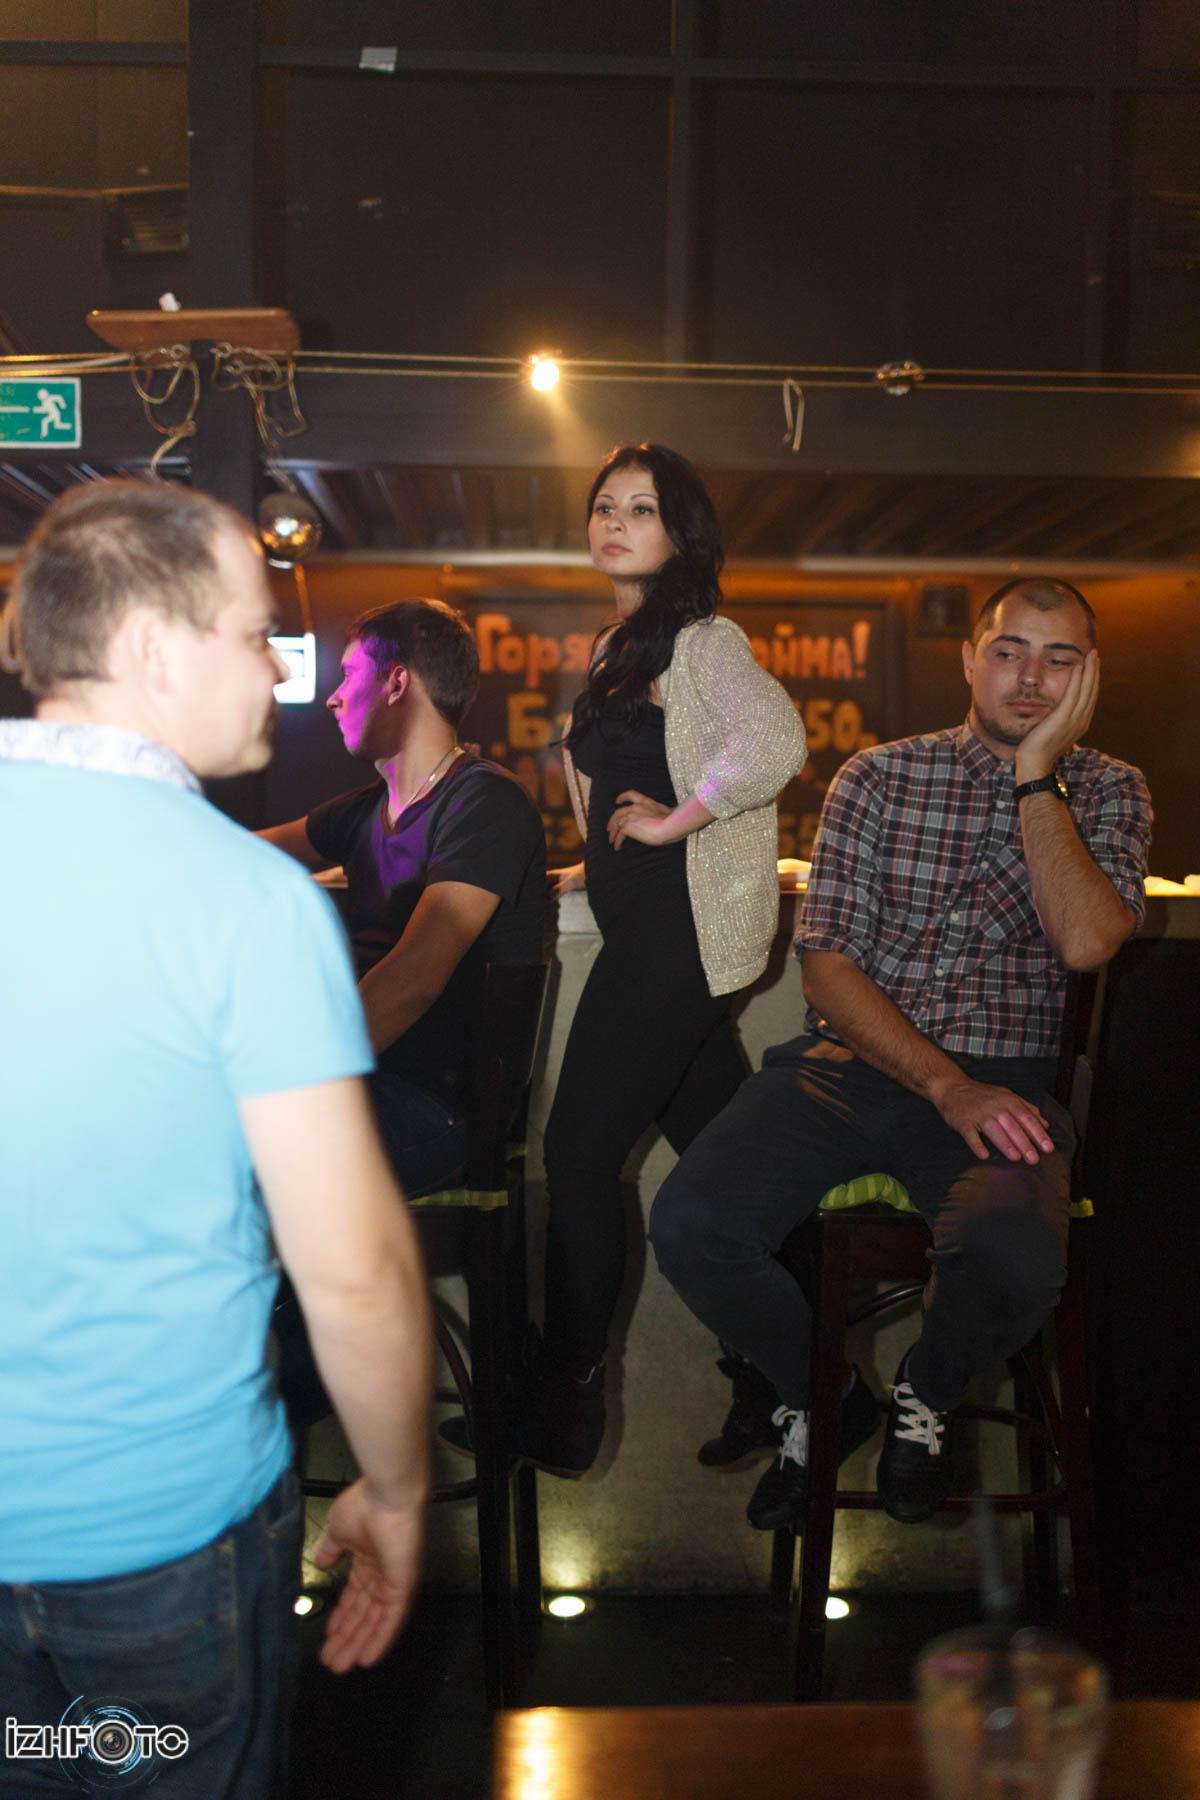 Арт вечеринка в Ижевске